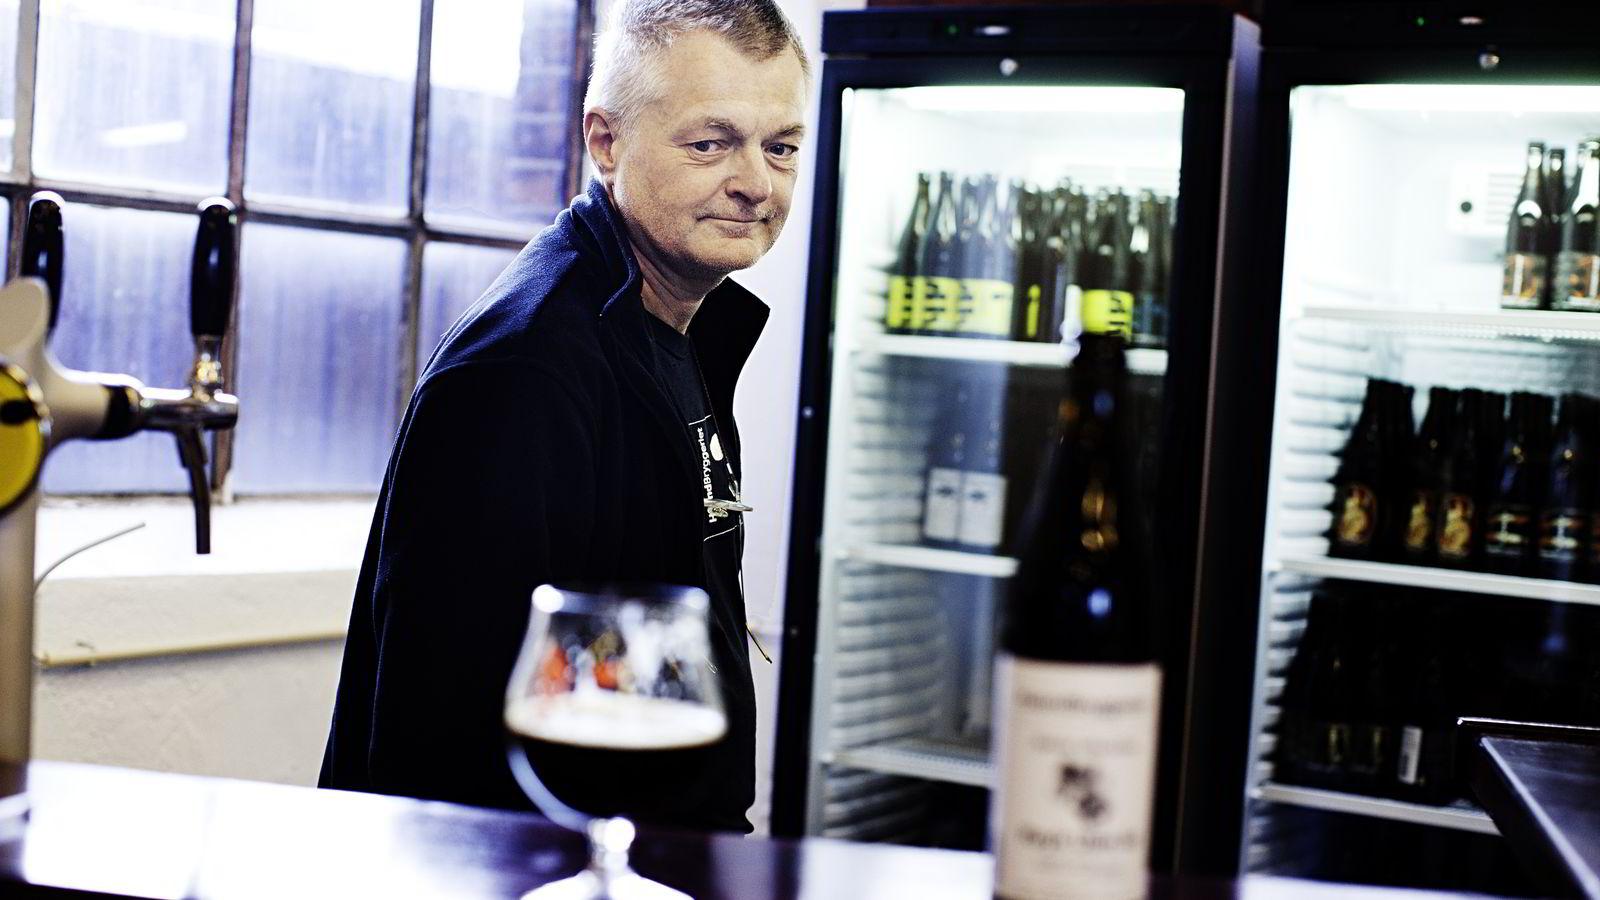 Drammen, Norge, 12.12.2011, Jens Maudal bryggerisjef. Haandbryggeriet i Drammen er et vellykket mikrobryggeri. Foto: Per Thrana